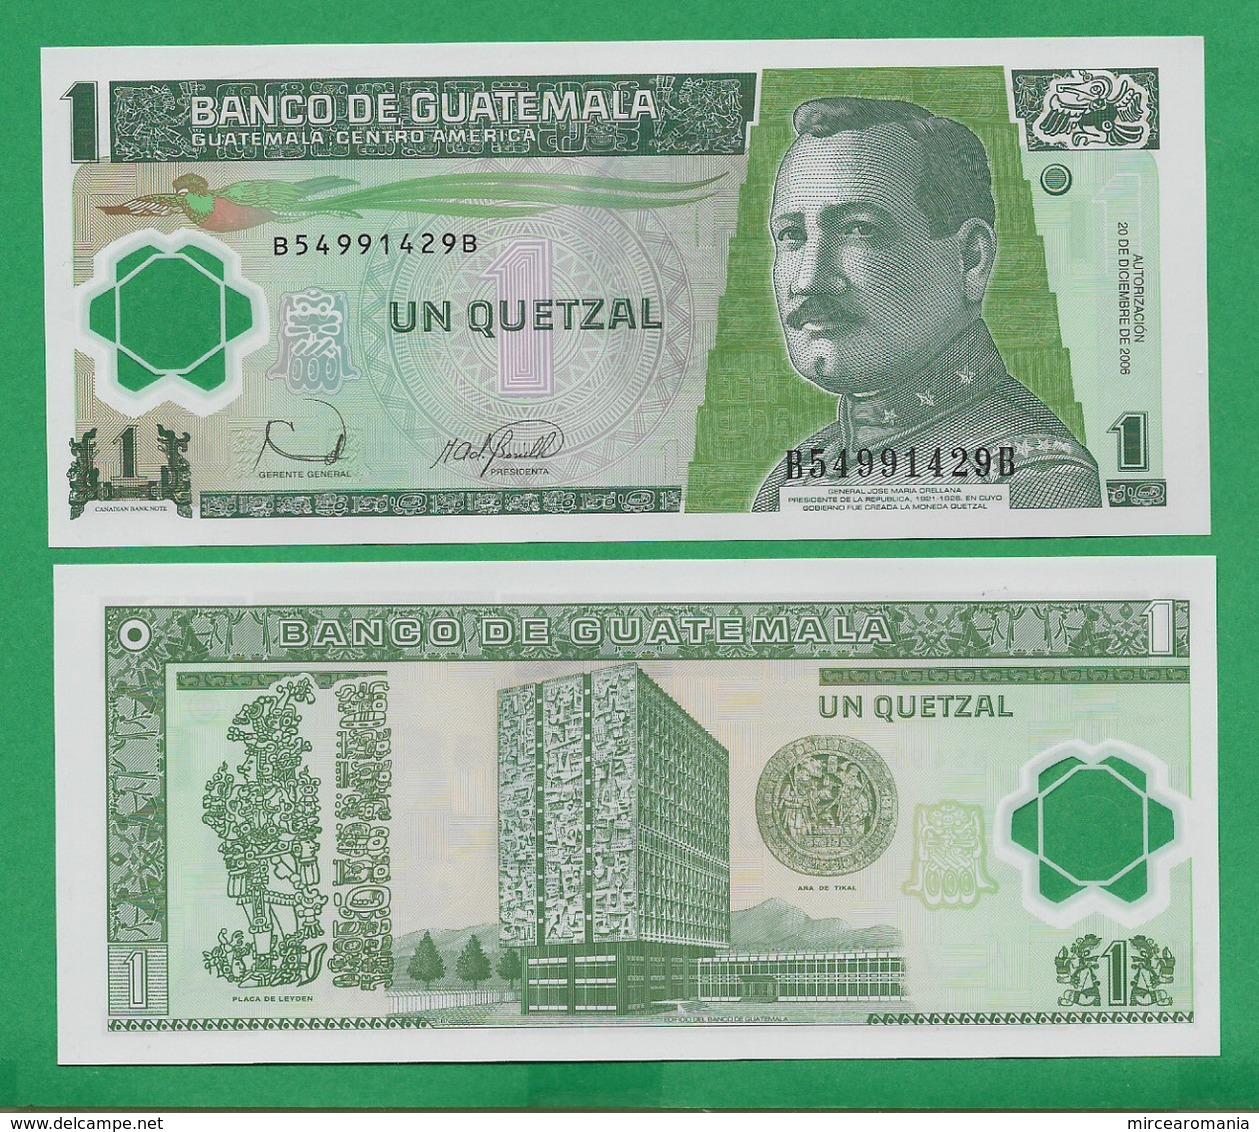 GUATEMALA - 1 QUETZAL - 2006 - POLYMER - UNC - Guatemala